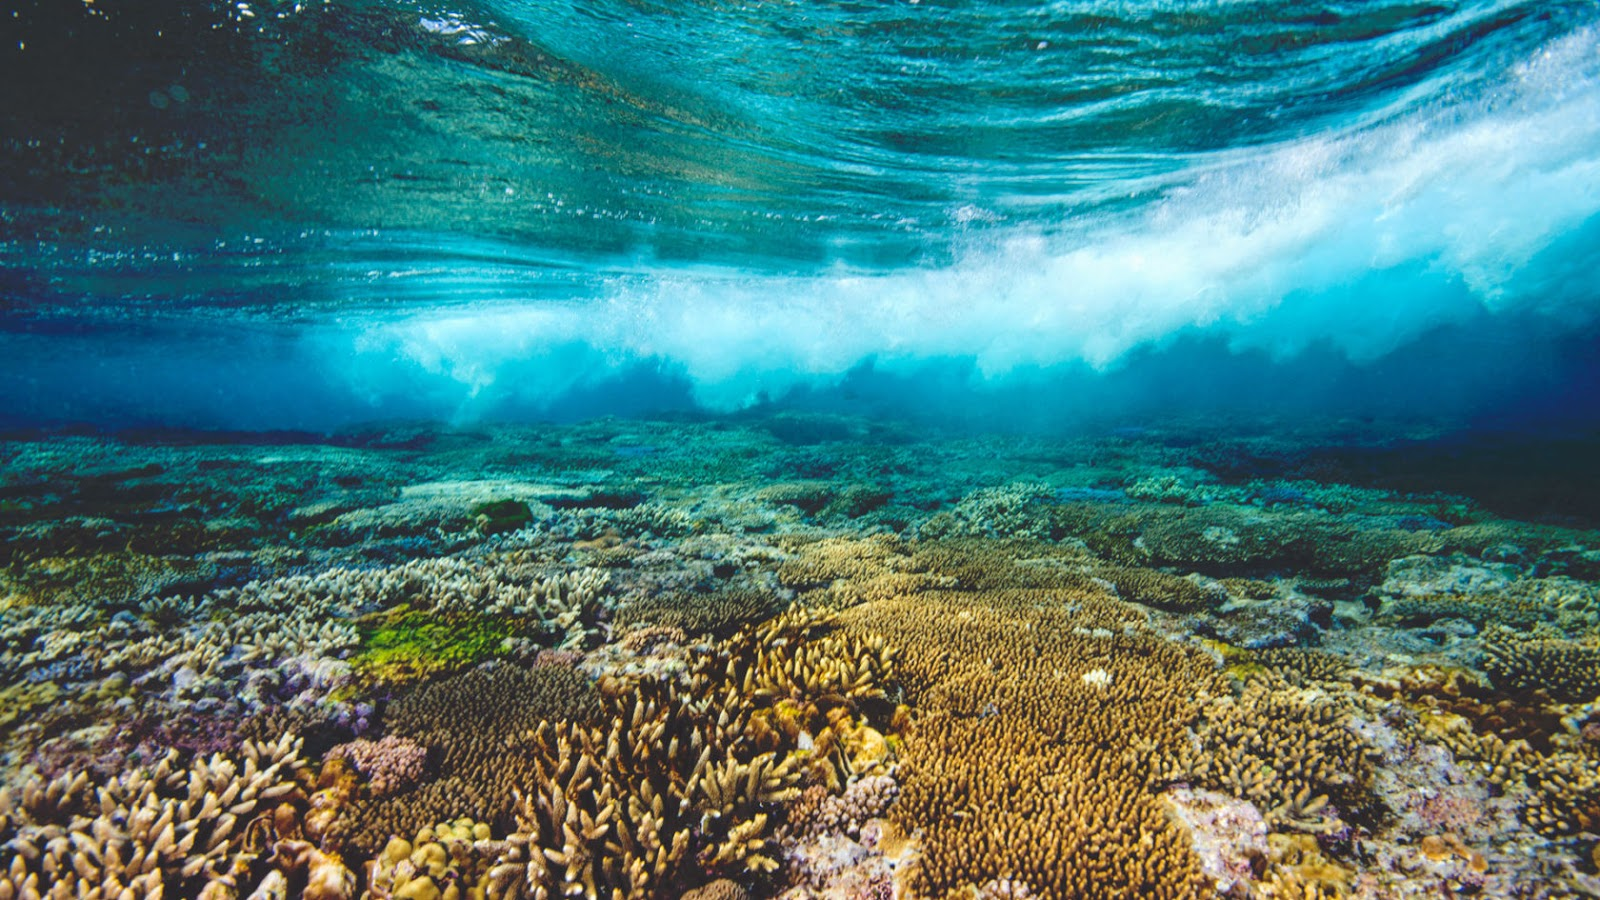 Grande Barreira de Corais  Great Barrier Reef   Austrália